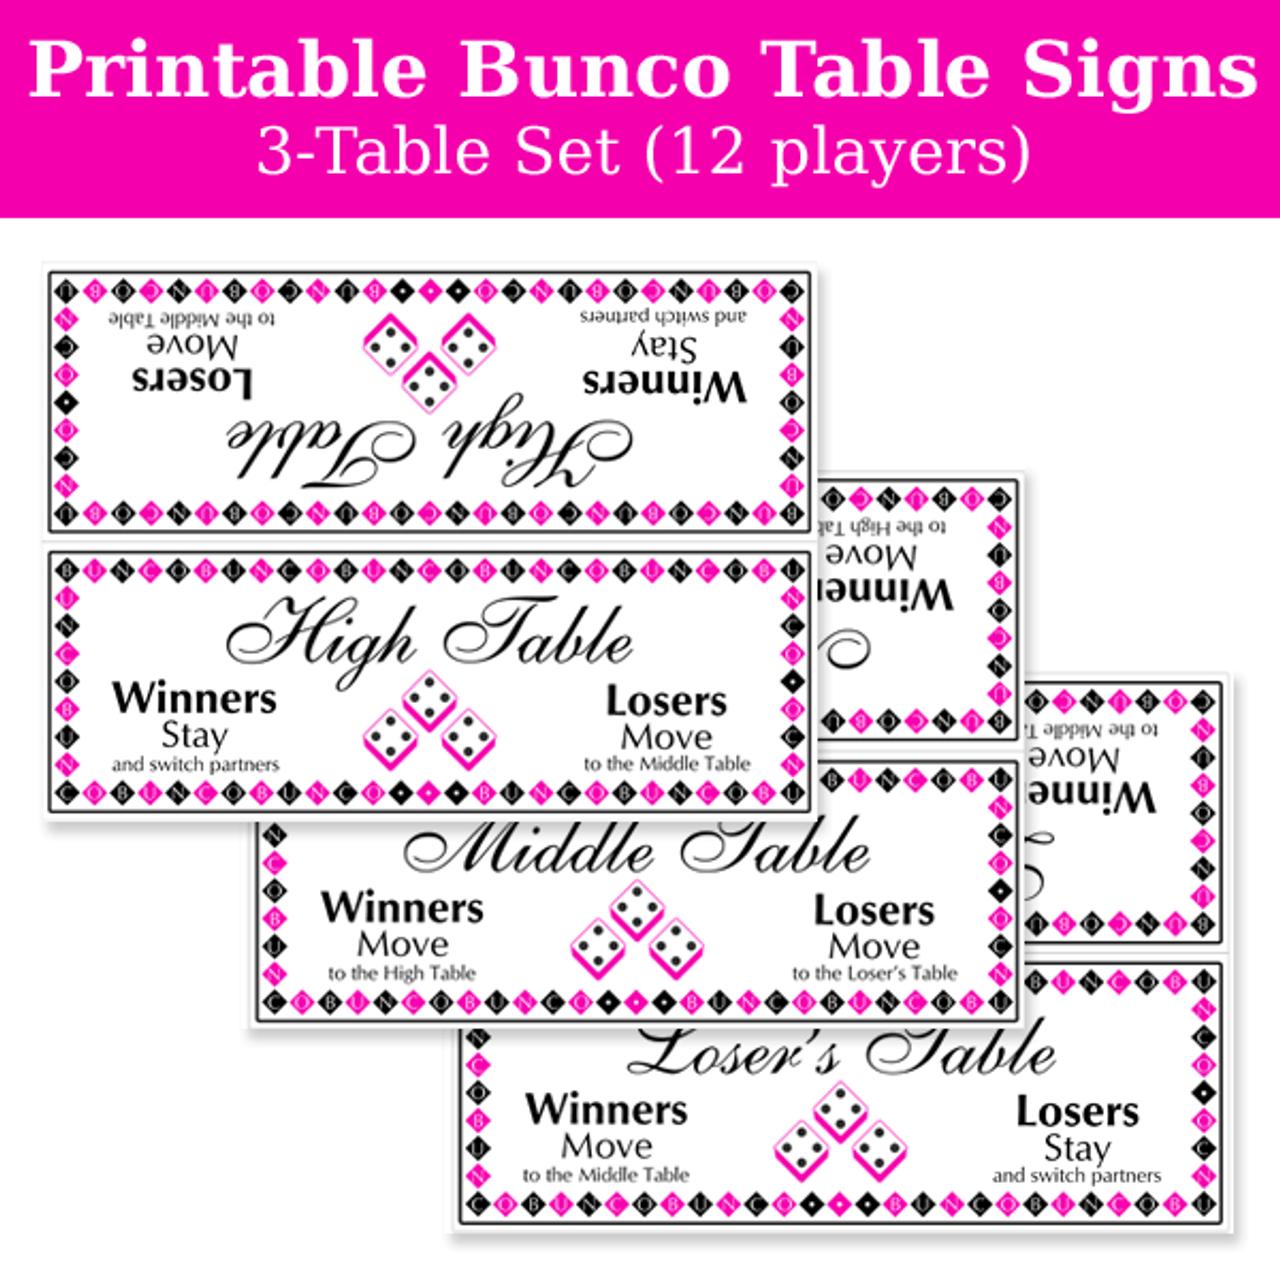 graphic regarding Bunco Rules Printable named Printable Bunco Desk Indications - 3-Desk Fixed